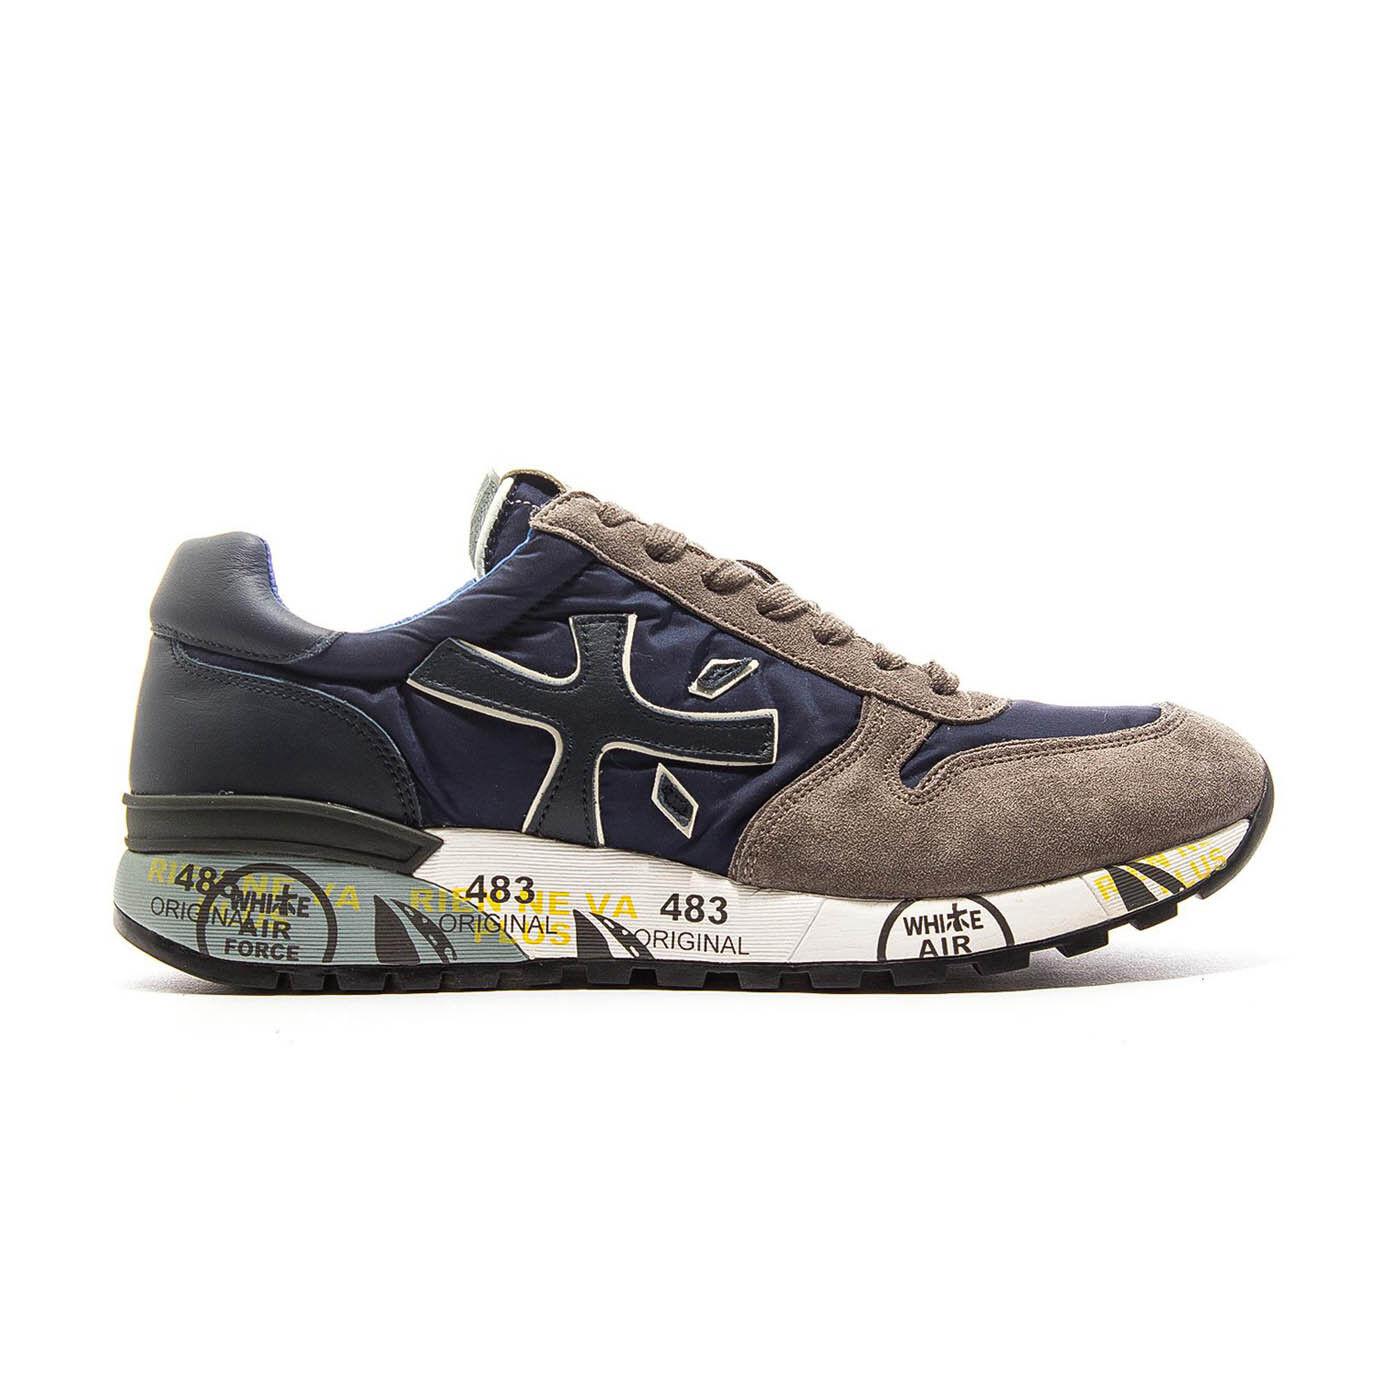 Premiata Mick 2326 Cuir - Tissu Italien Baskets blue - brown